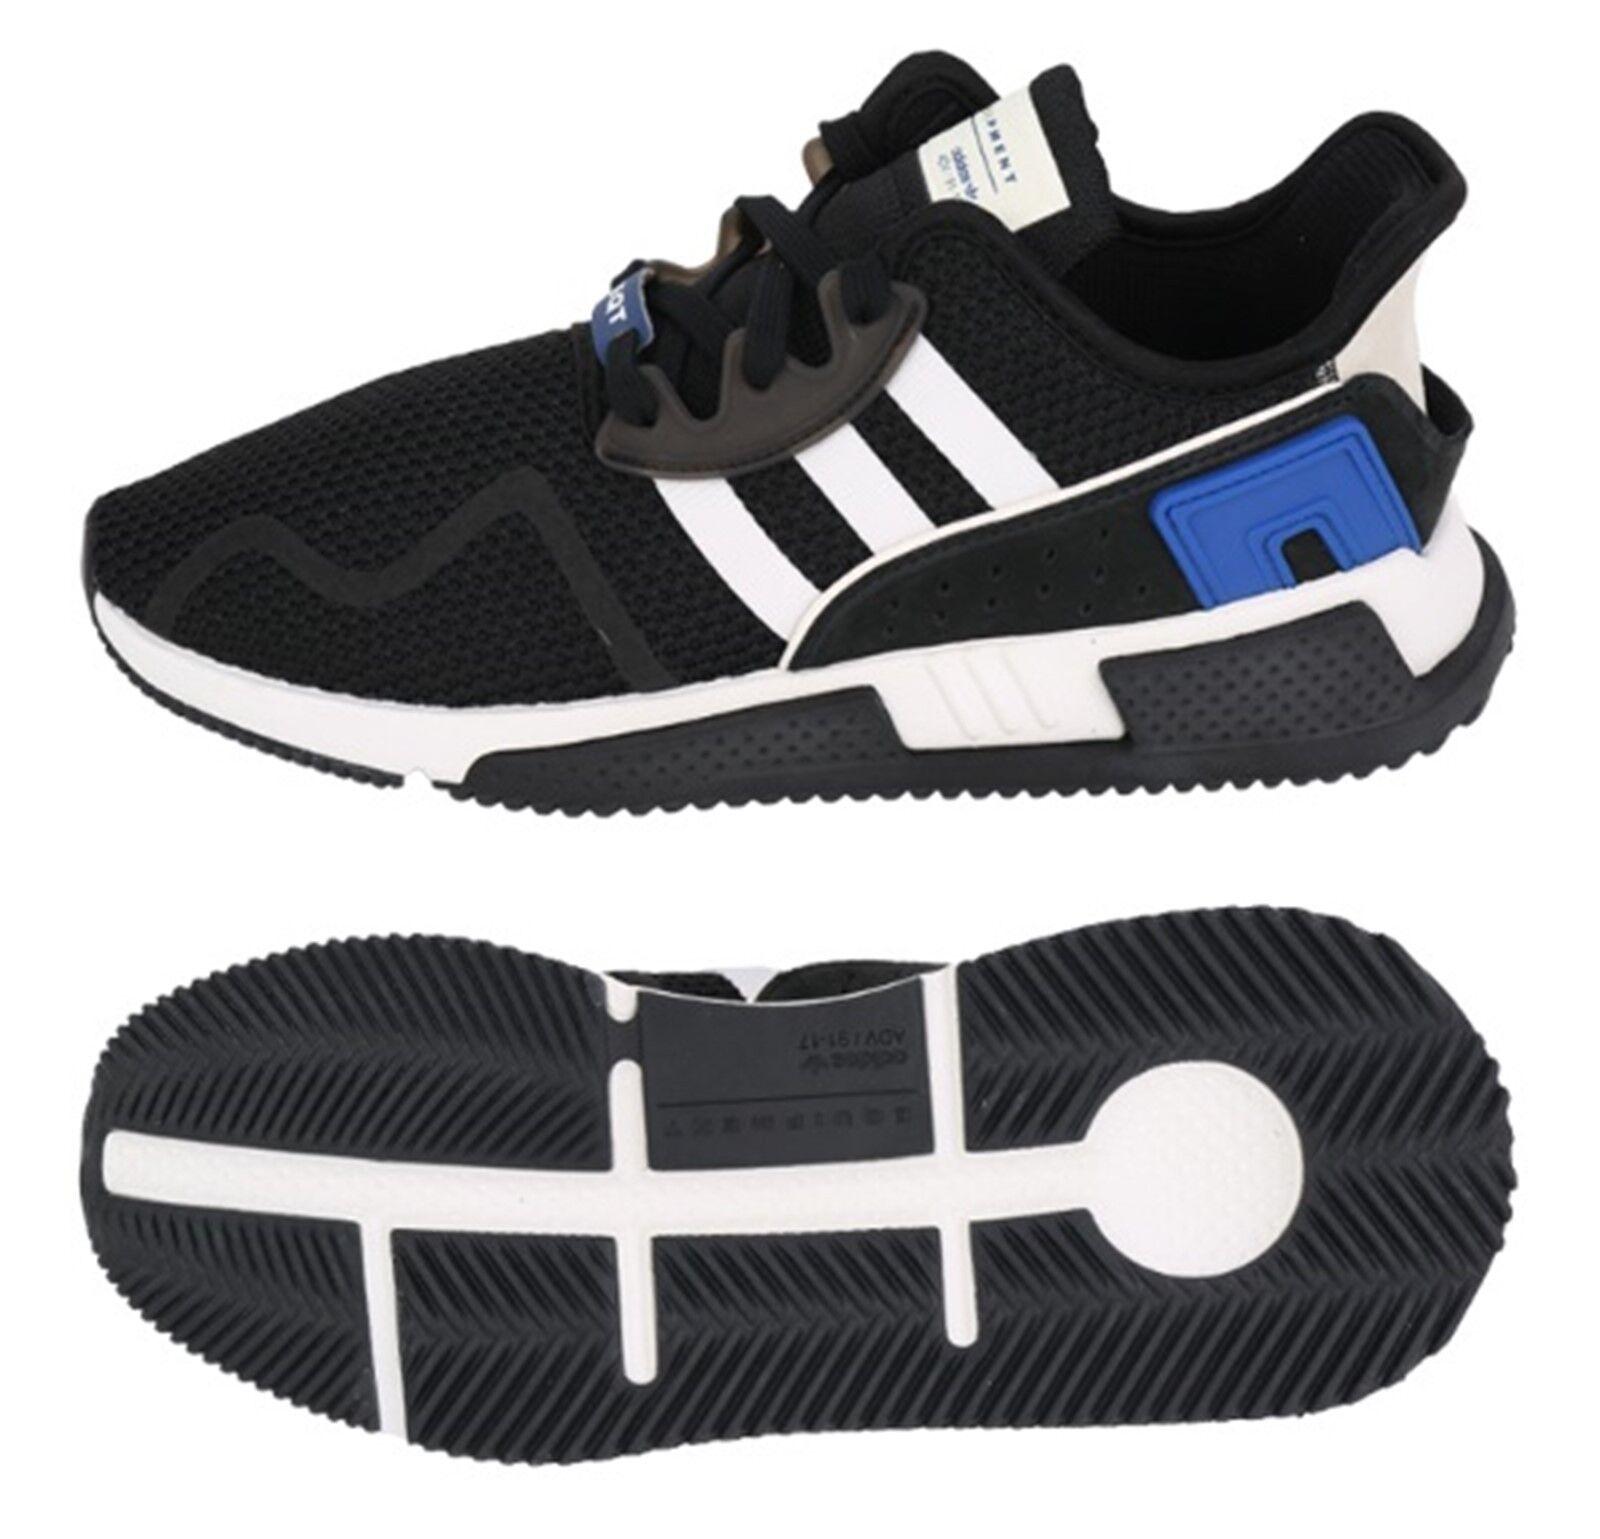 Adidas Men Originals EQT Cushion ADV shoes Running Black Sneakers shoes CQ2374